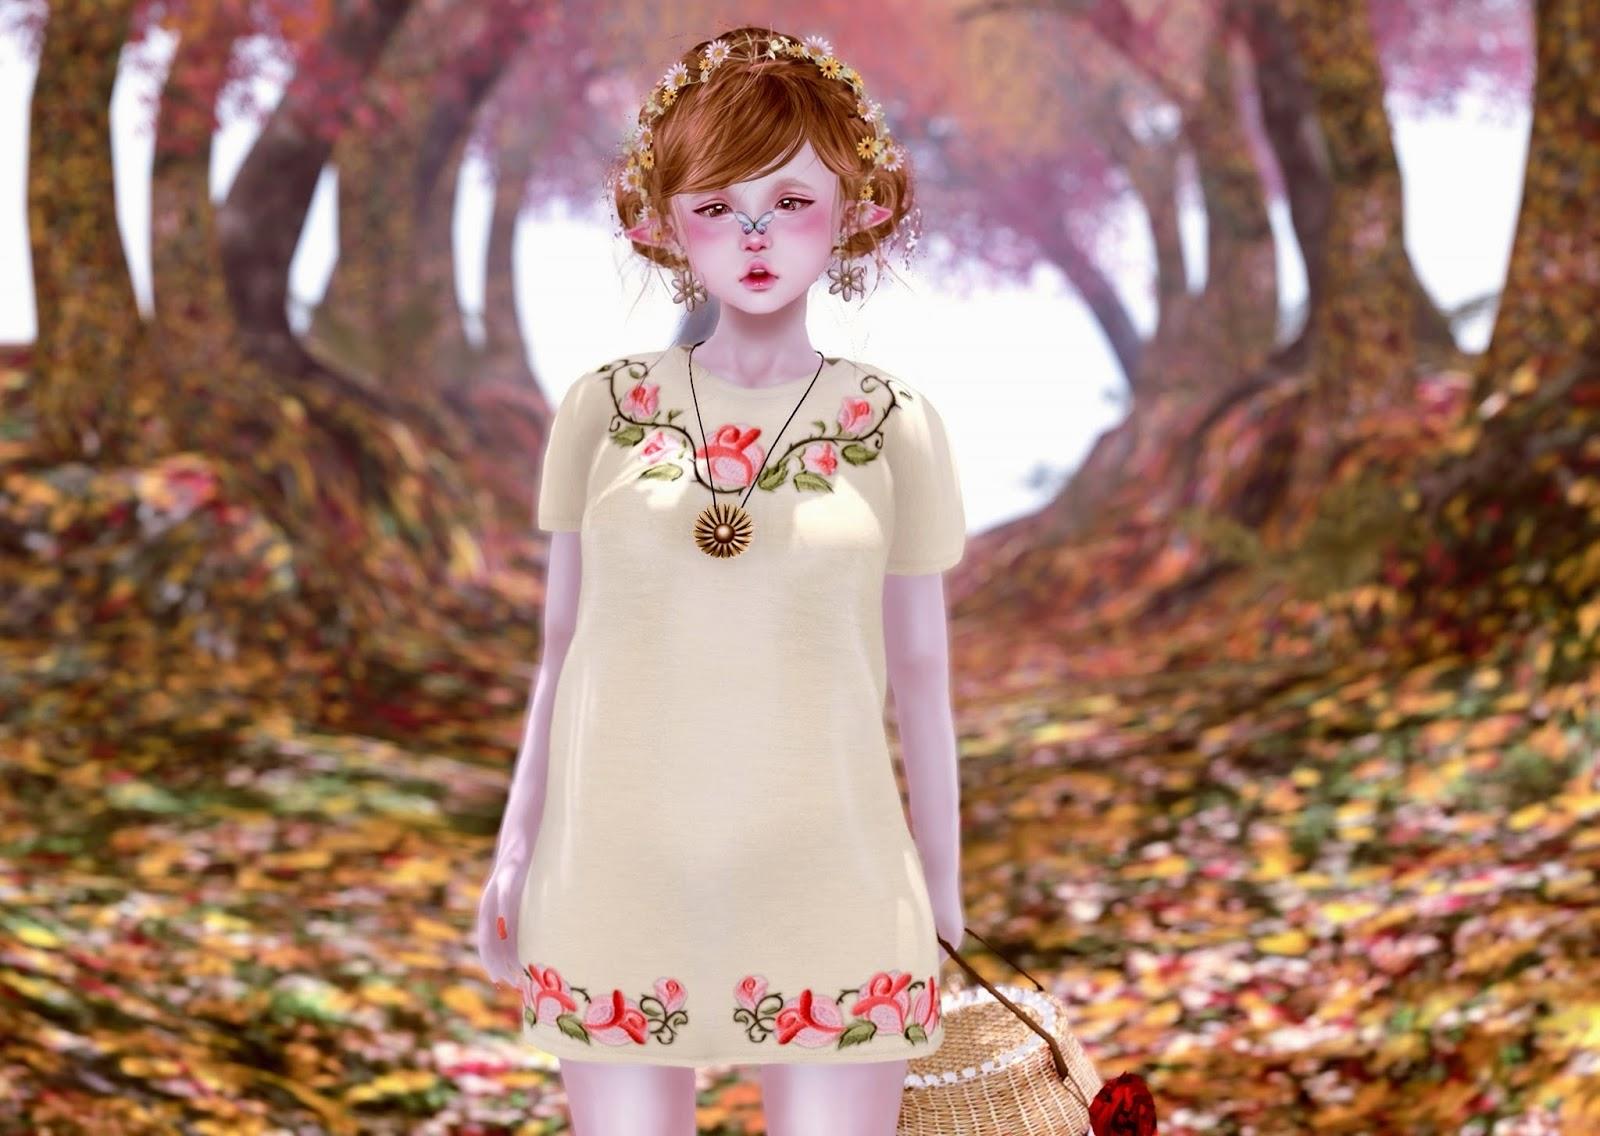 Cinderella Fashionista: Dressed in Yellow